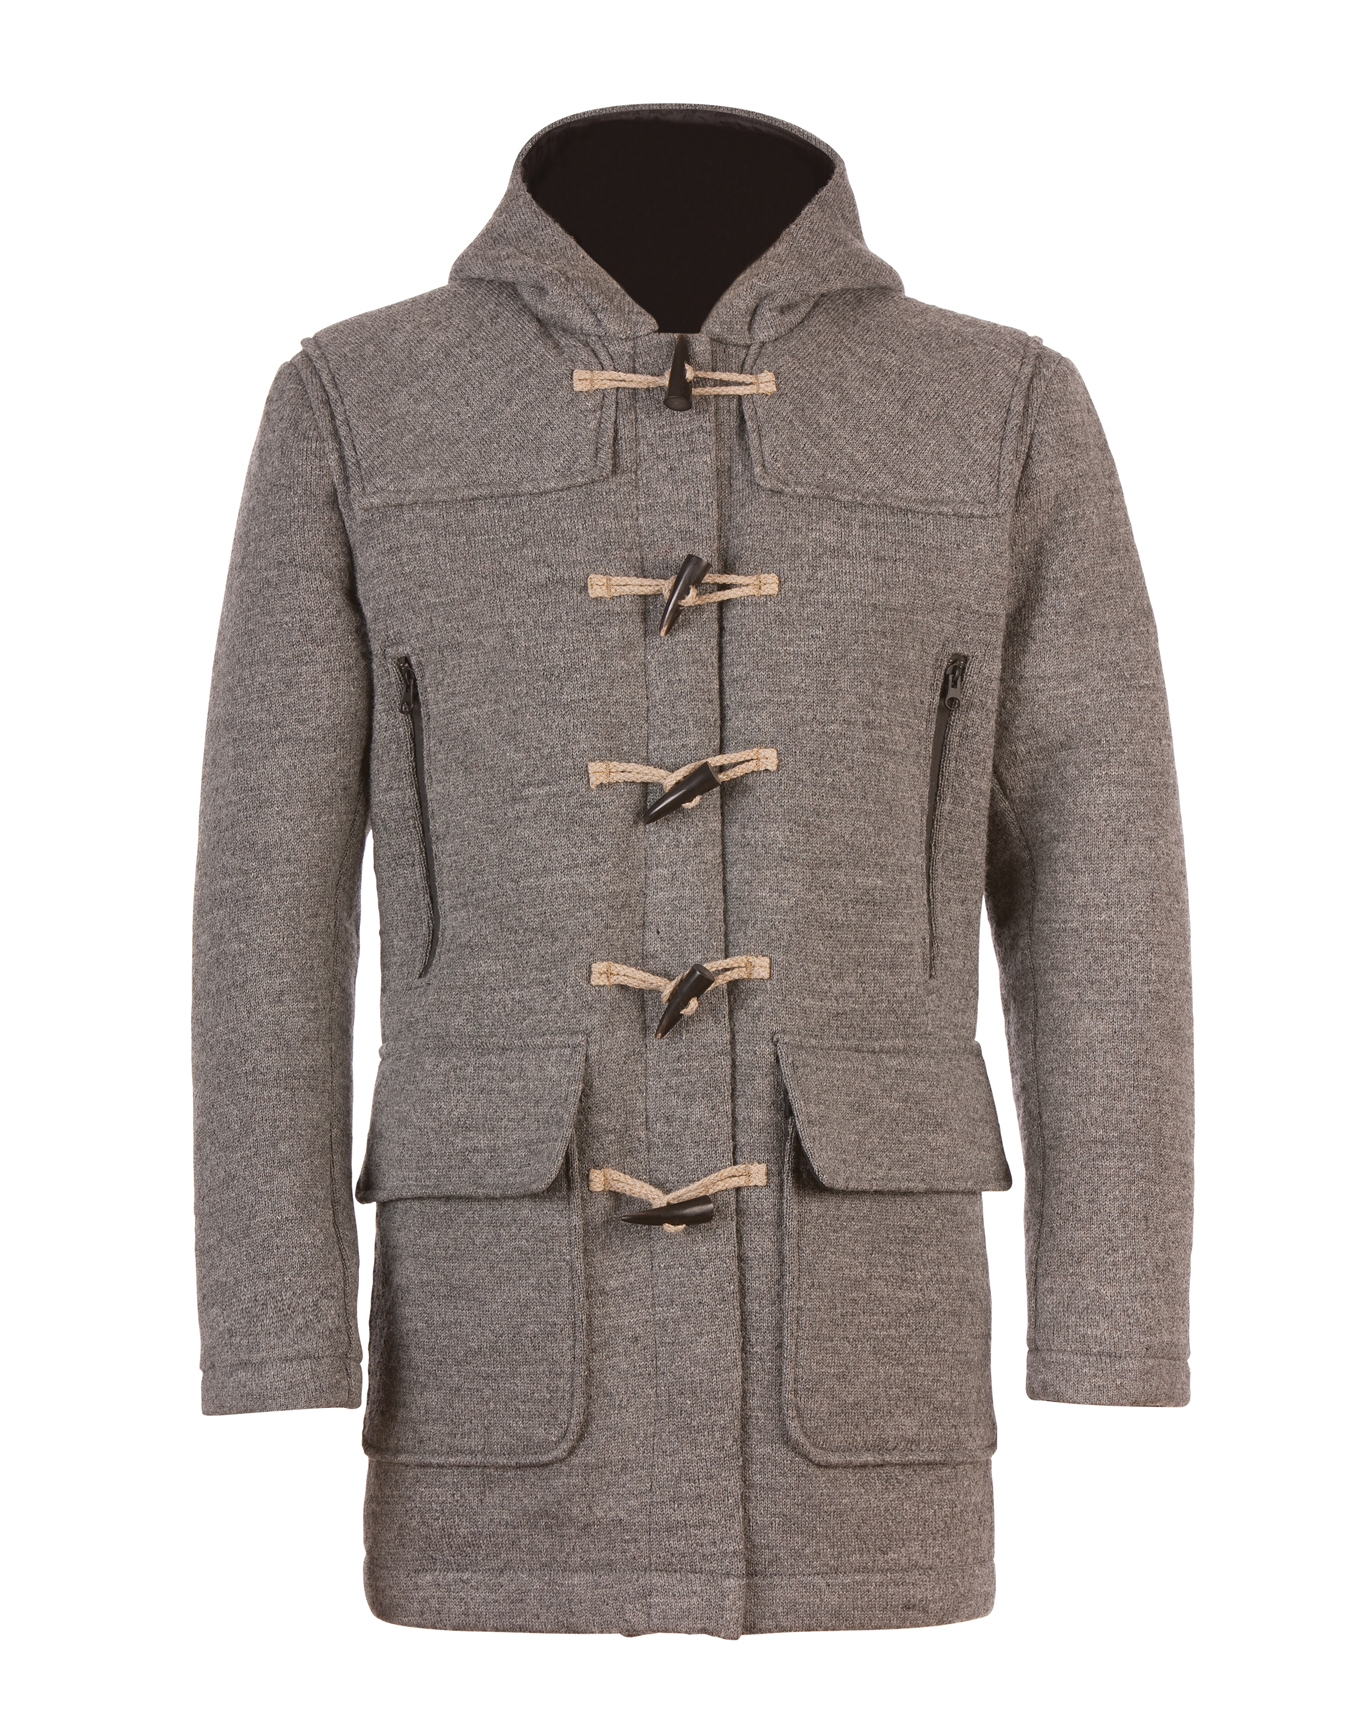 Oslo Knitshell dufflecoat